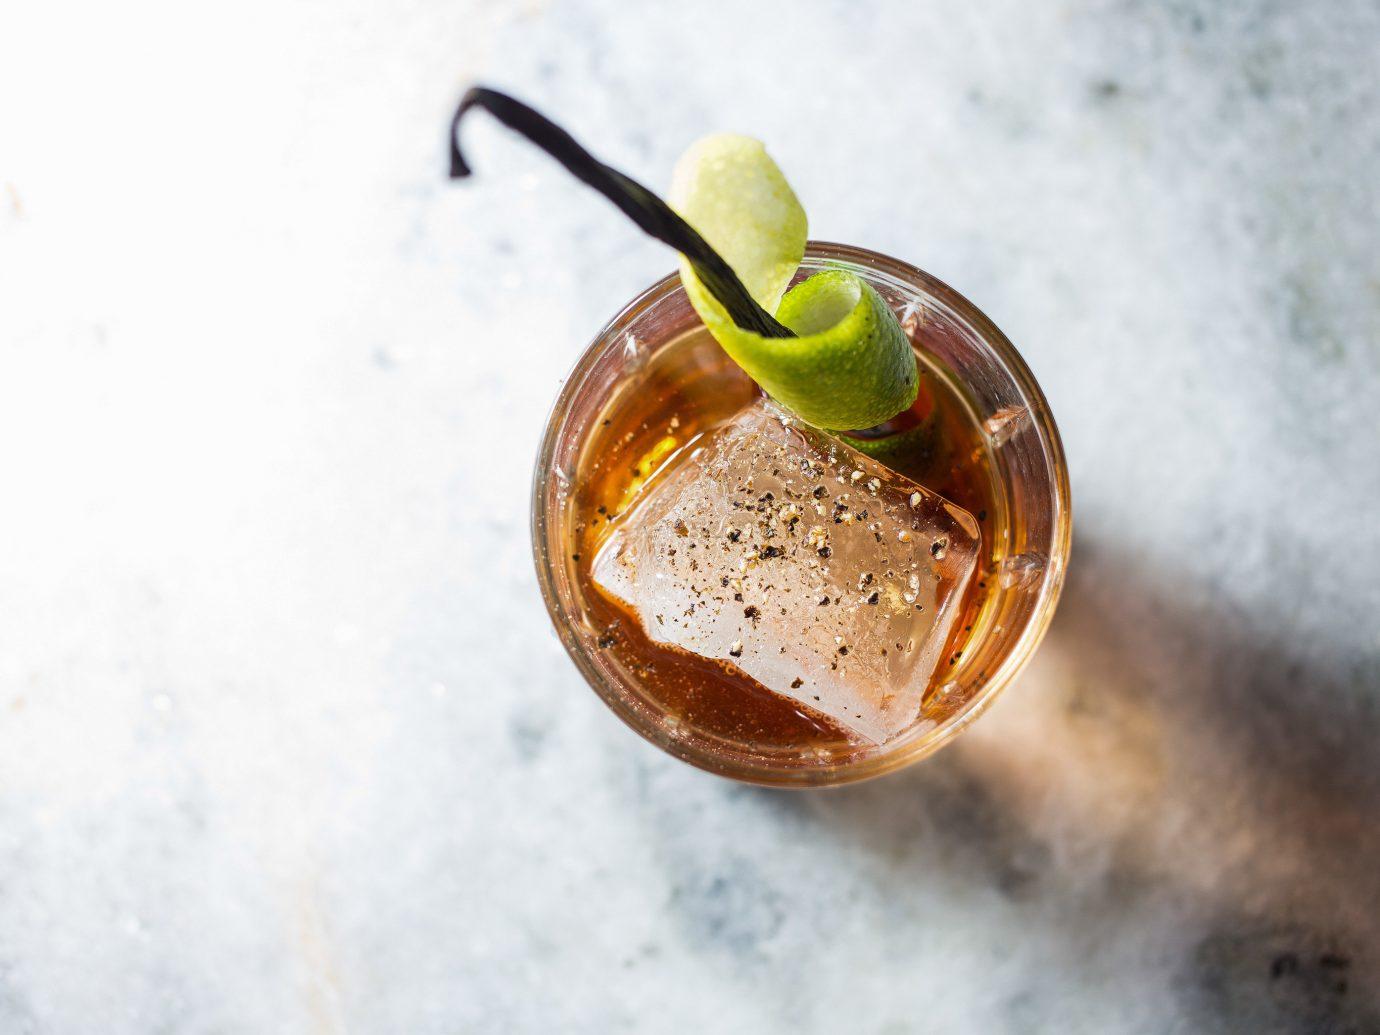 Trip Ideas Weekend Getaways Drink plant produce food distilled beverage cocktail fruit flavor